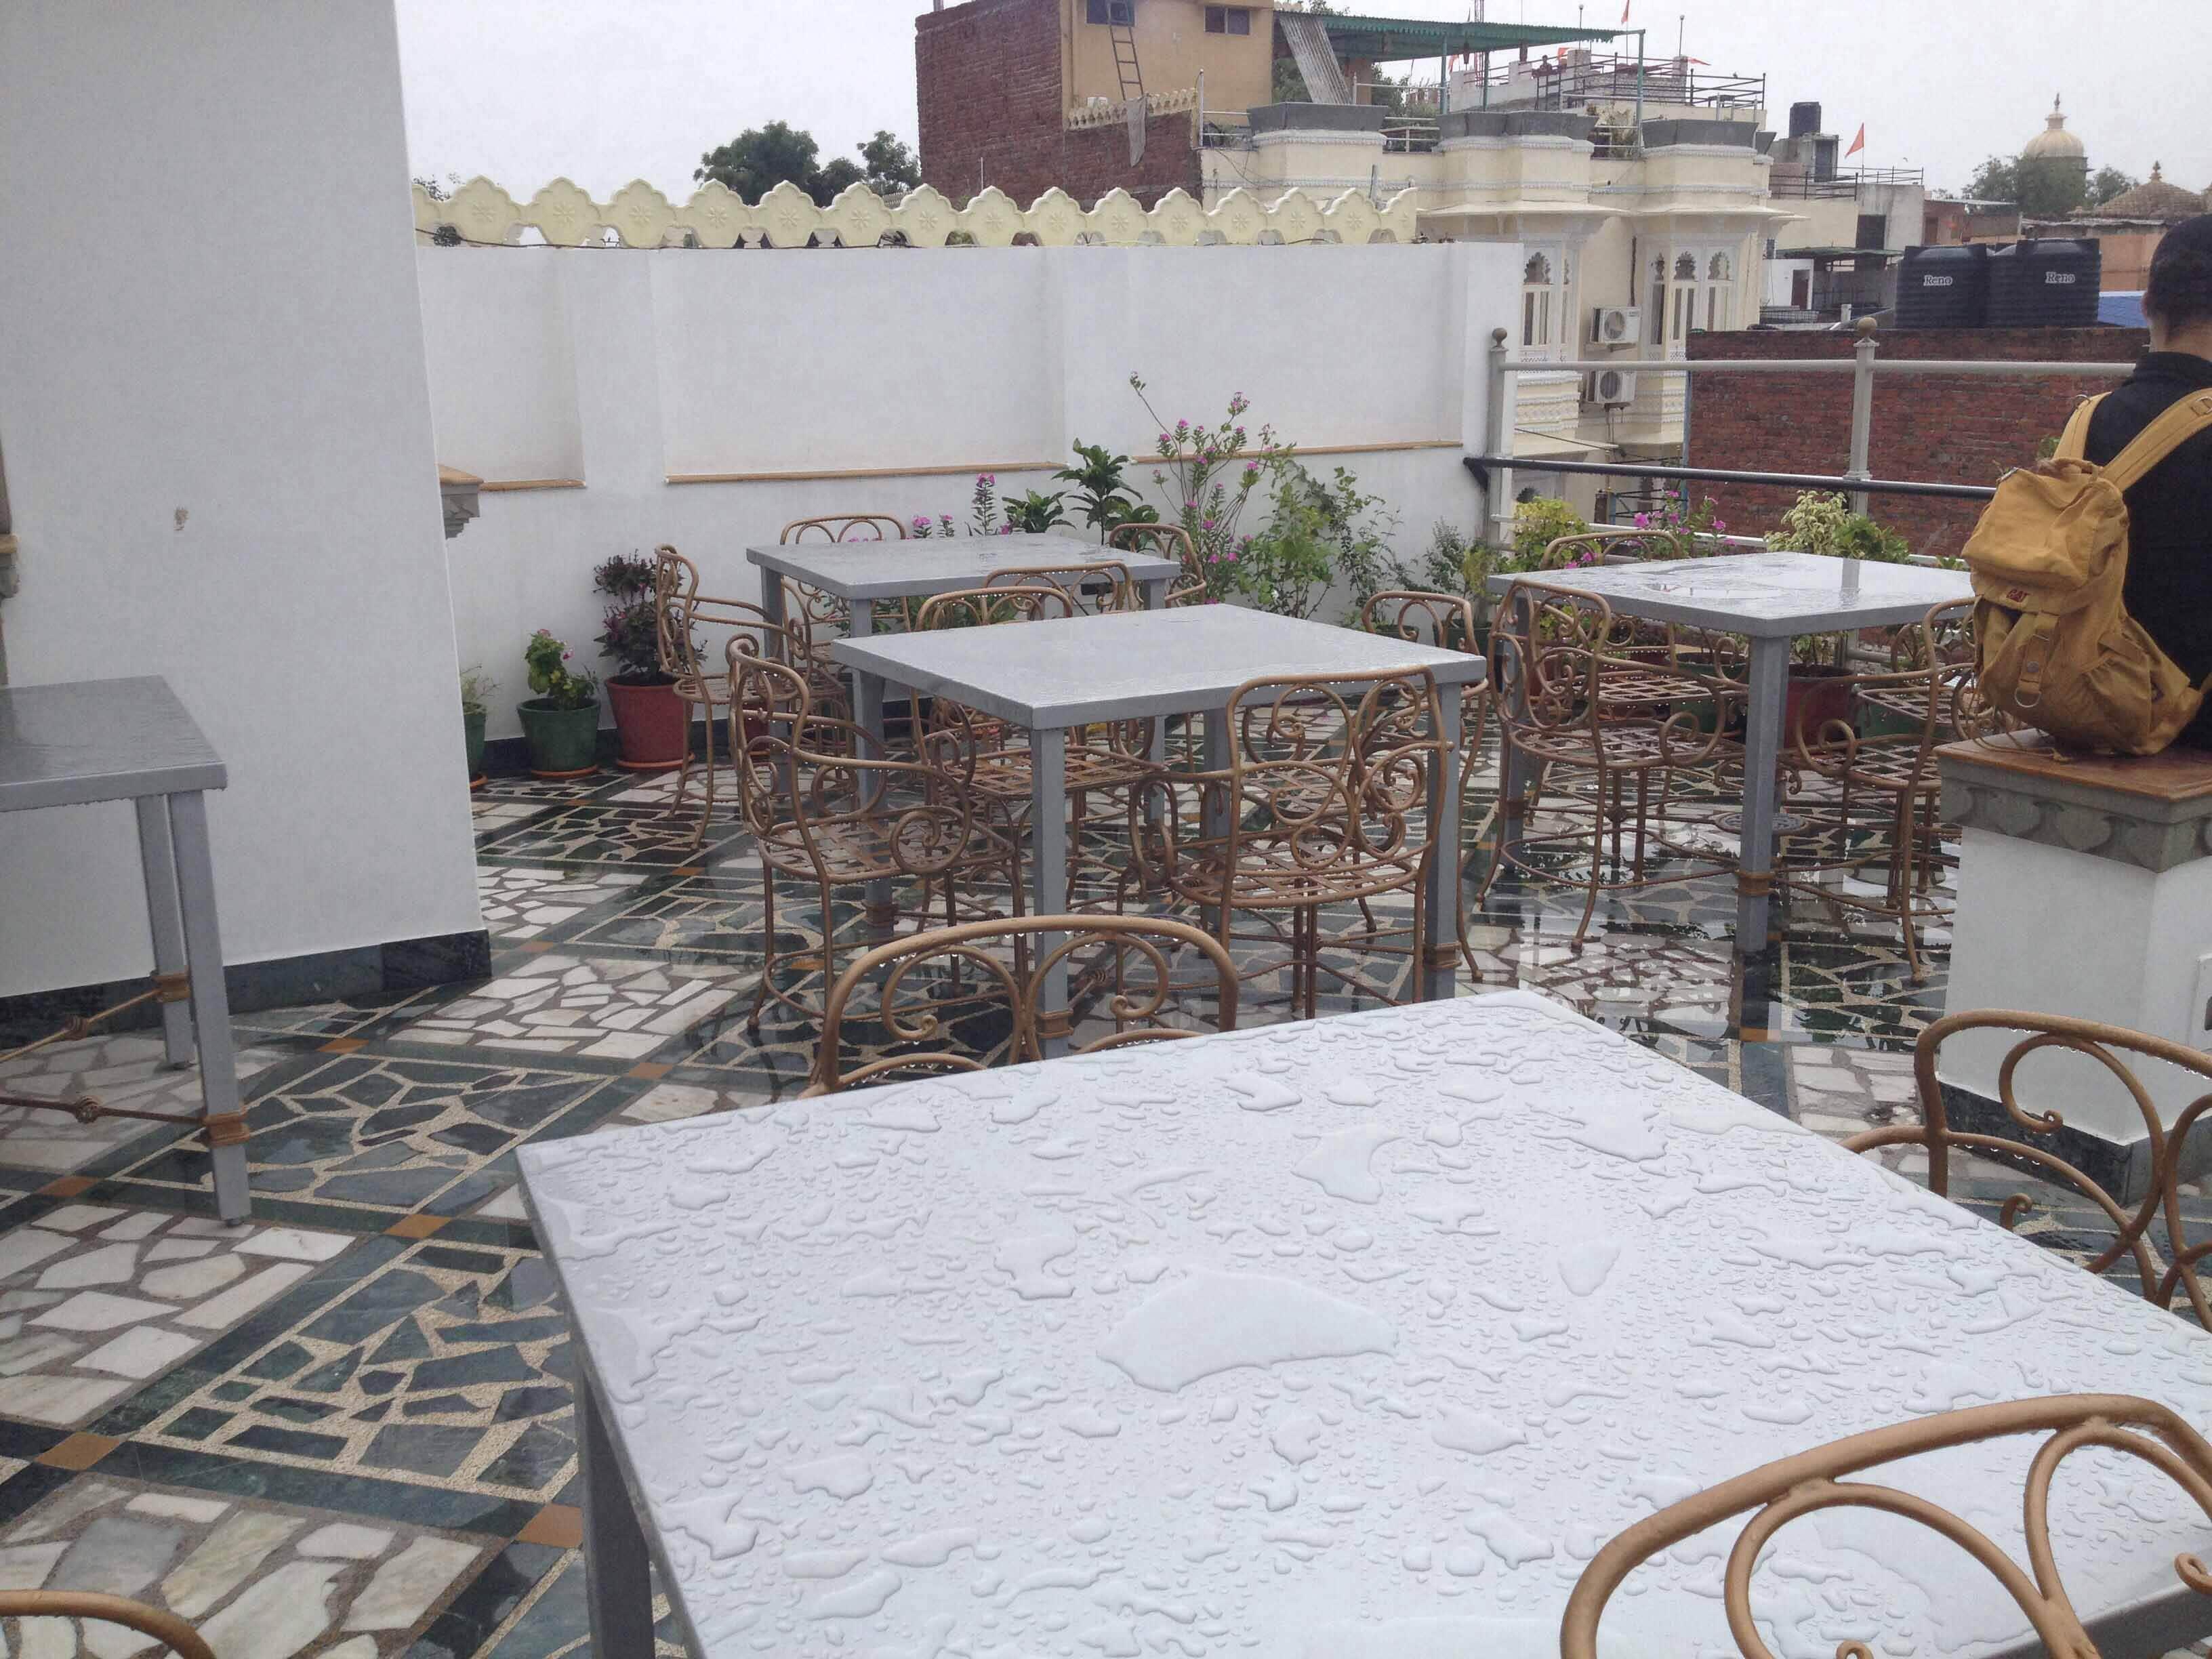 Poonam Haveli Rooftop Restaurant - Chandpole - Udaipur Image